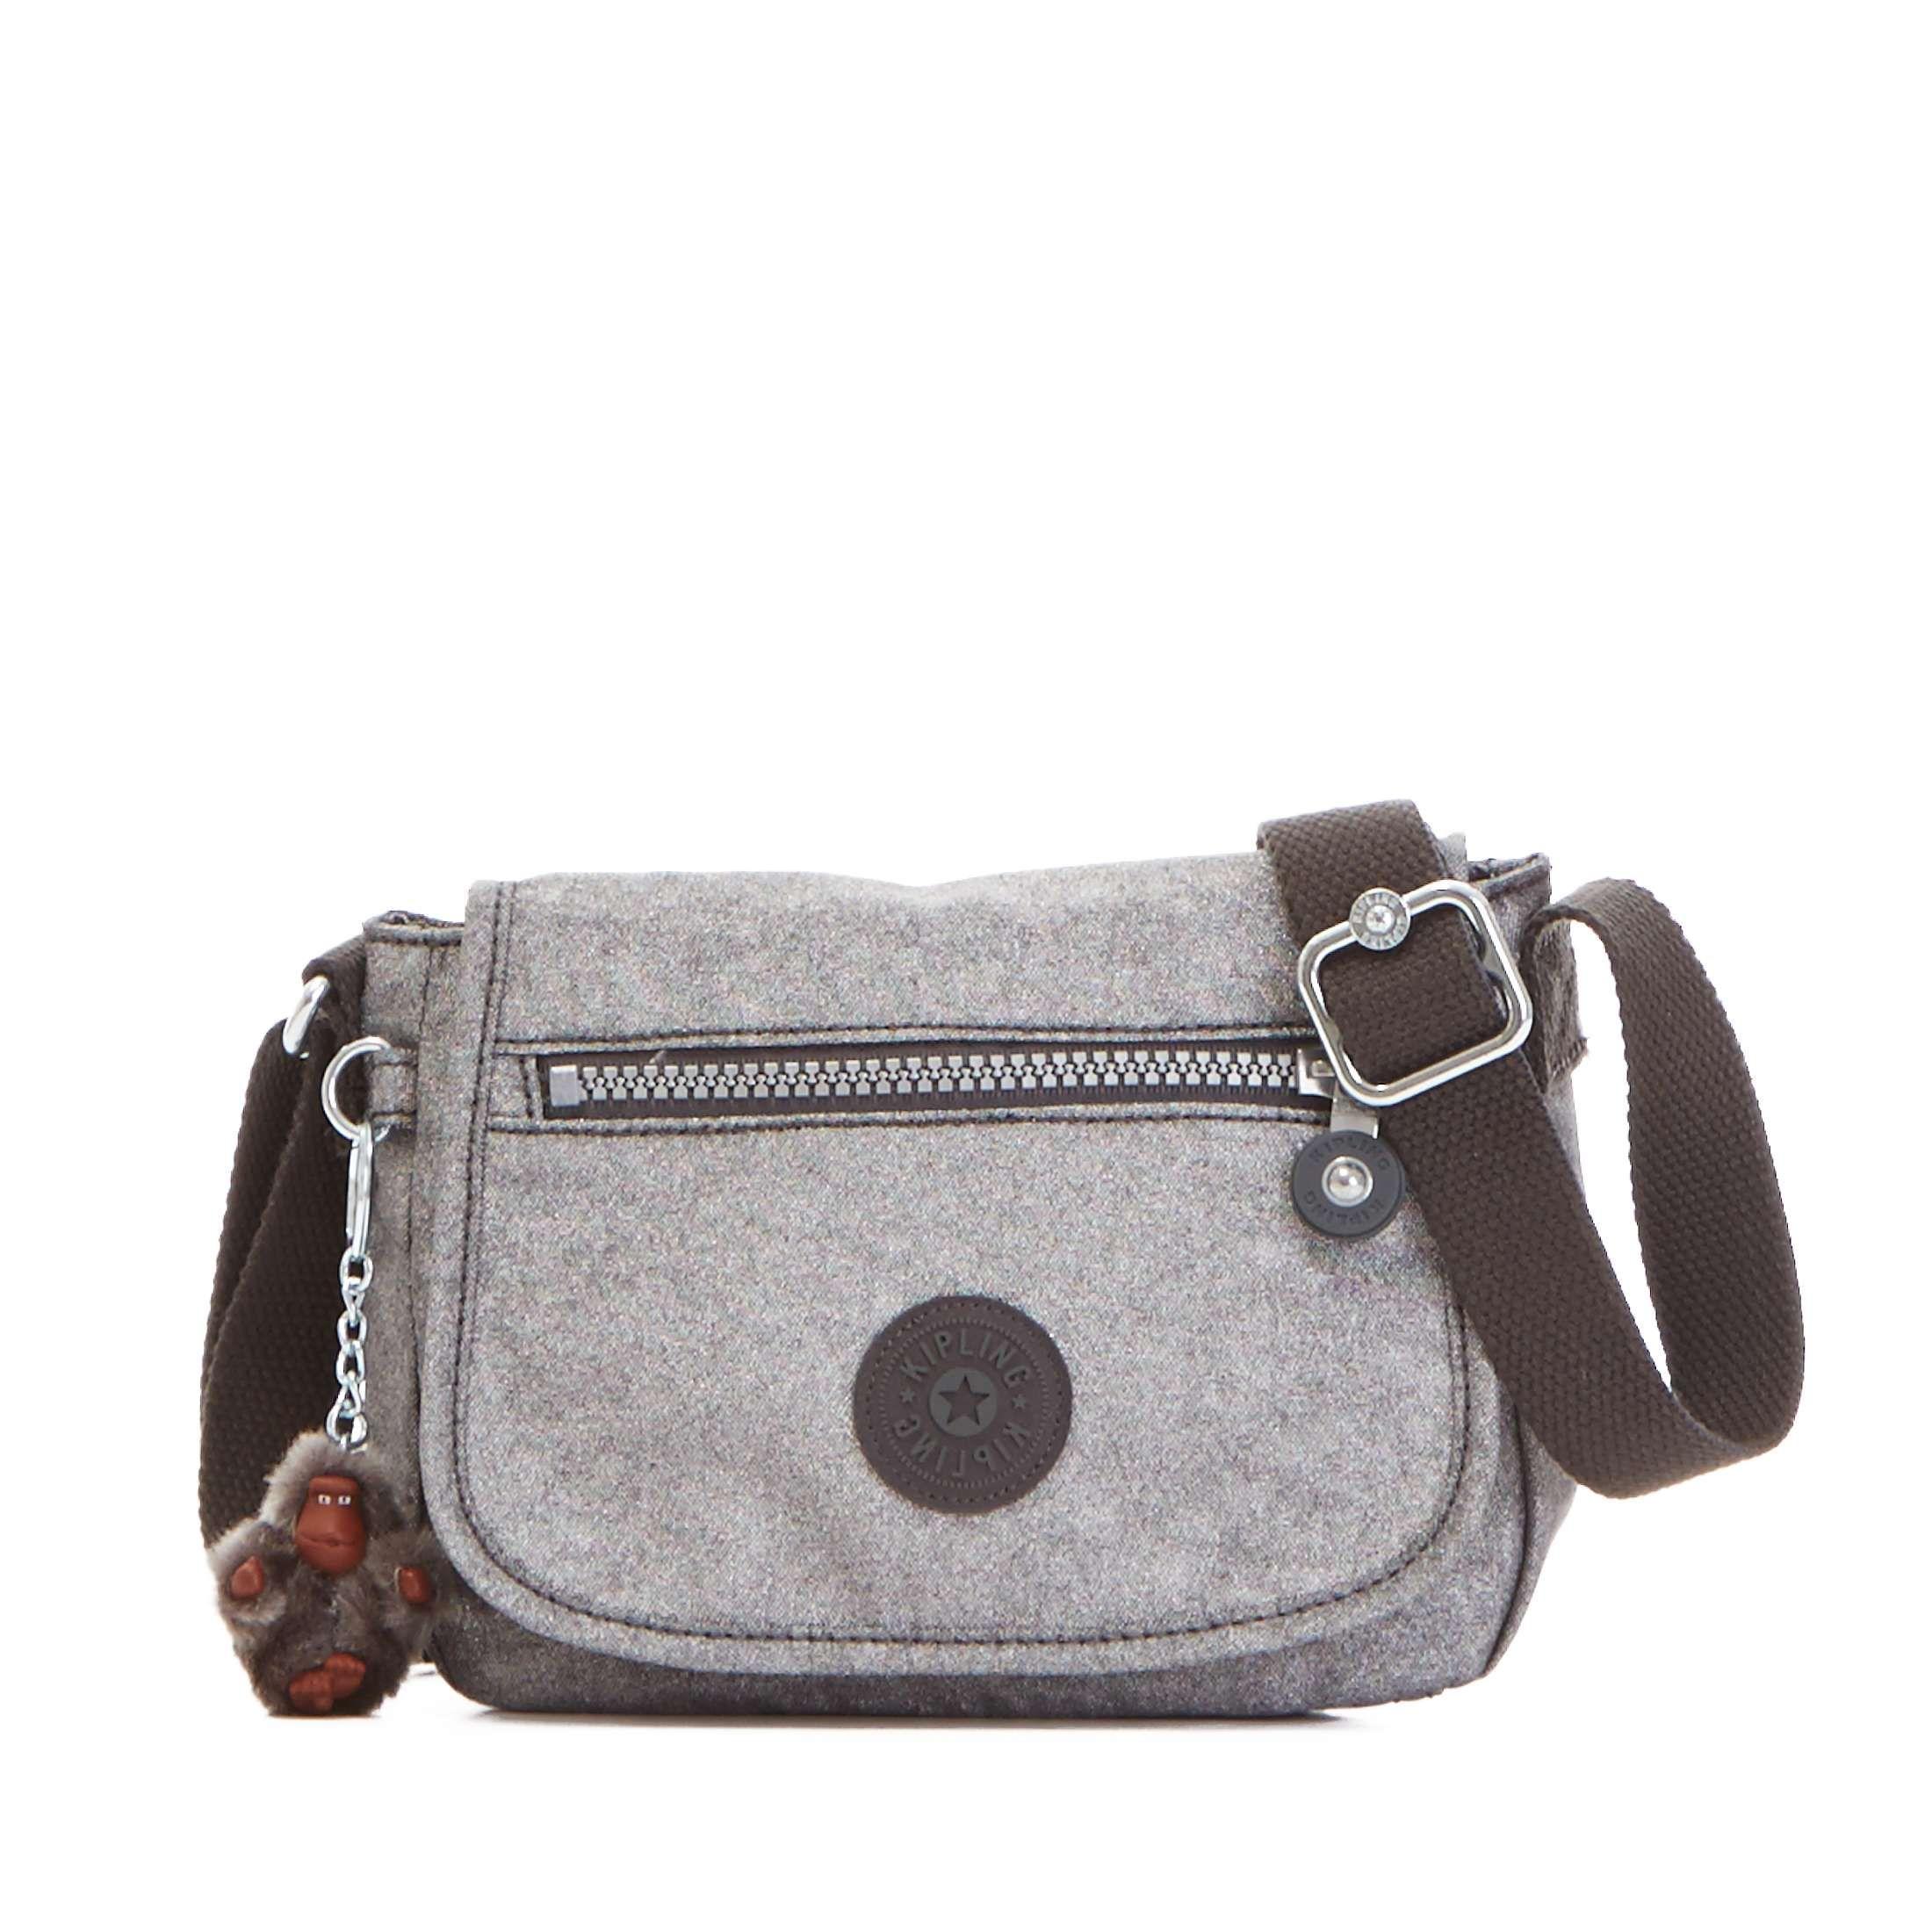 78e889c72537 Sabian Crossbody Metallic Mini Bag - Silver Glimmer